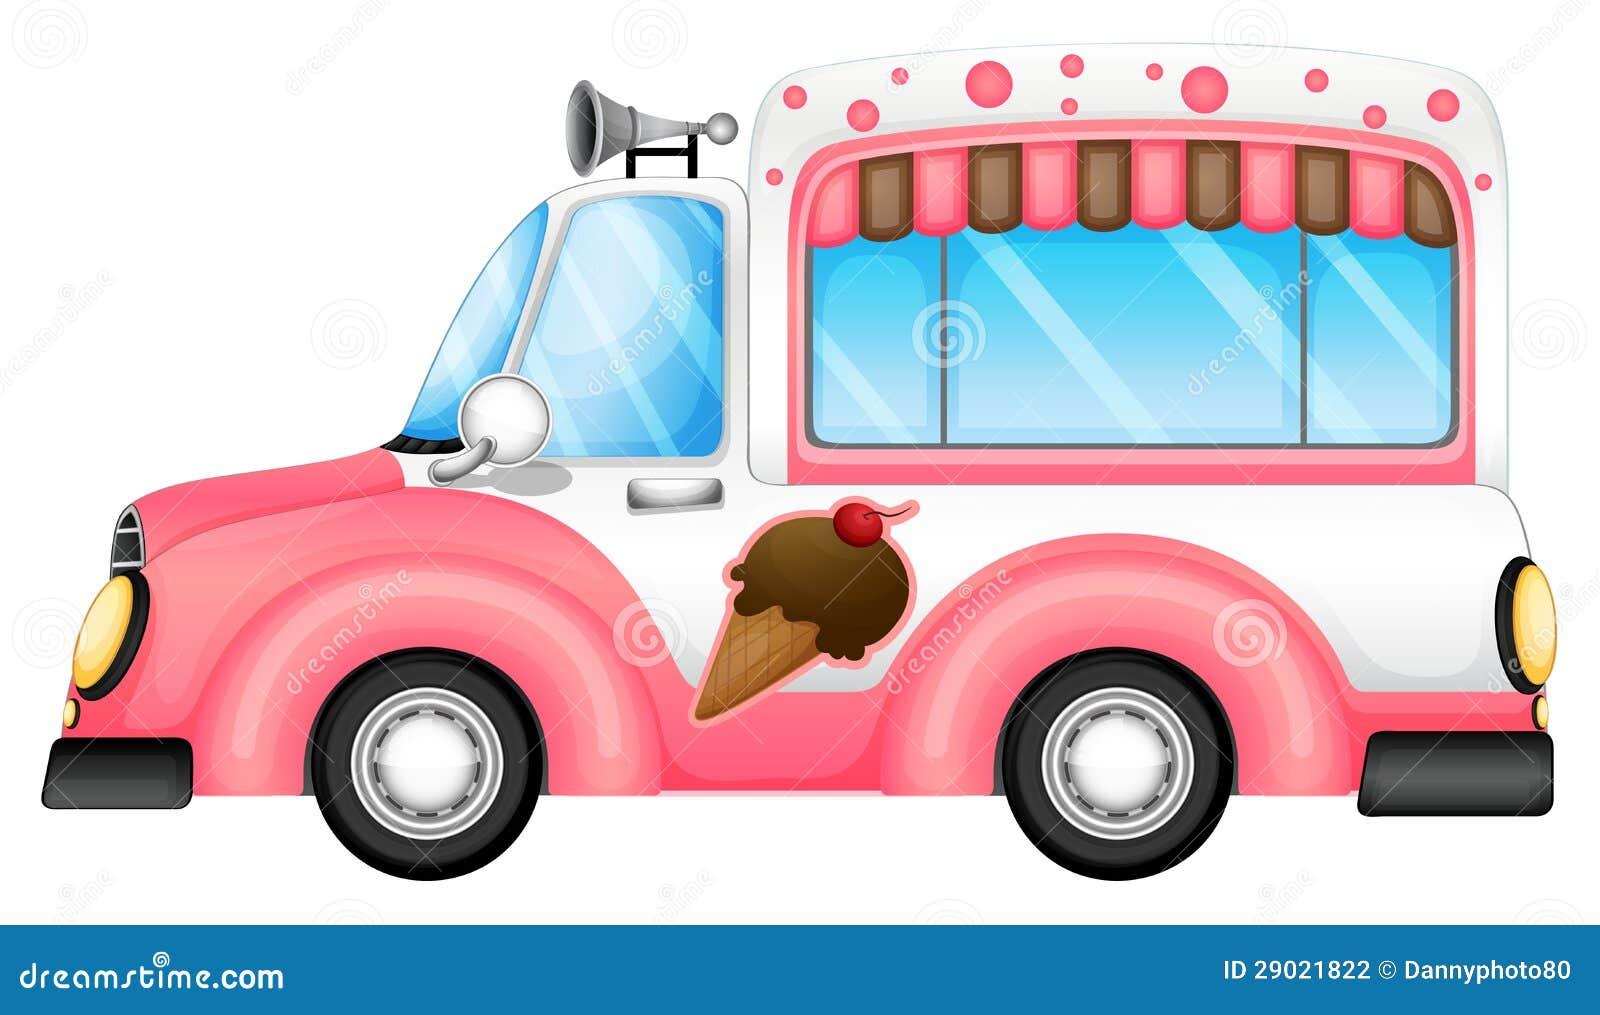 Stock Photography Ice Cream Car Image29021822 on Cartoon Moving Van Clip Art